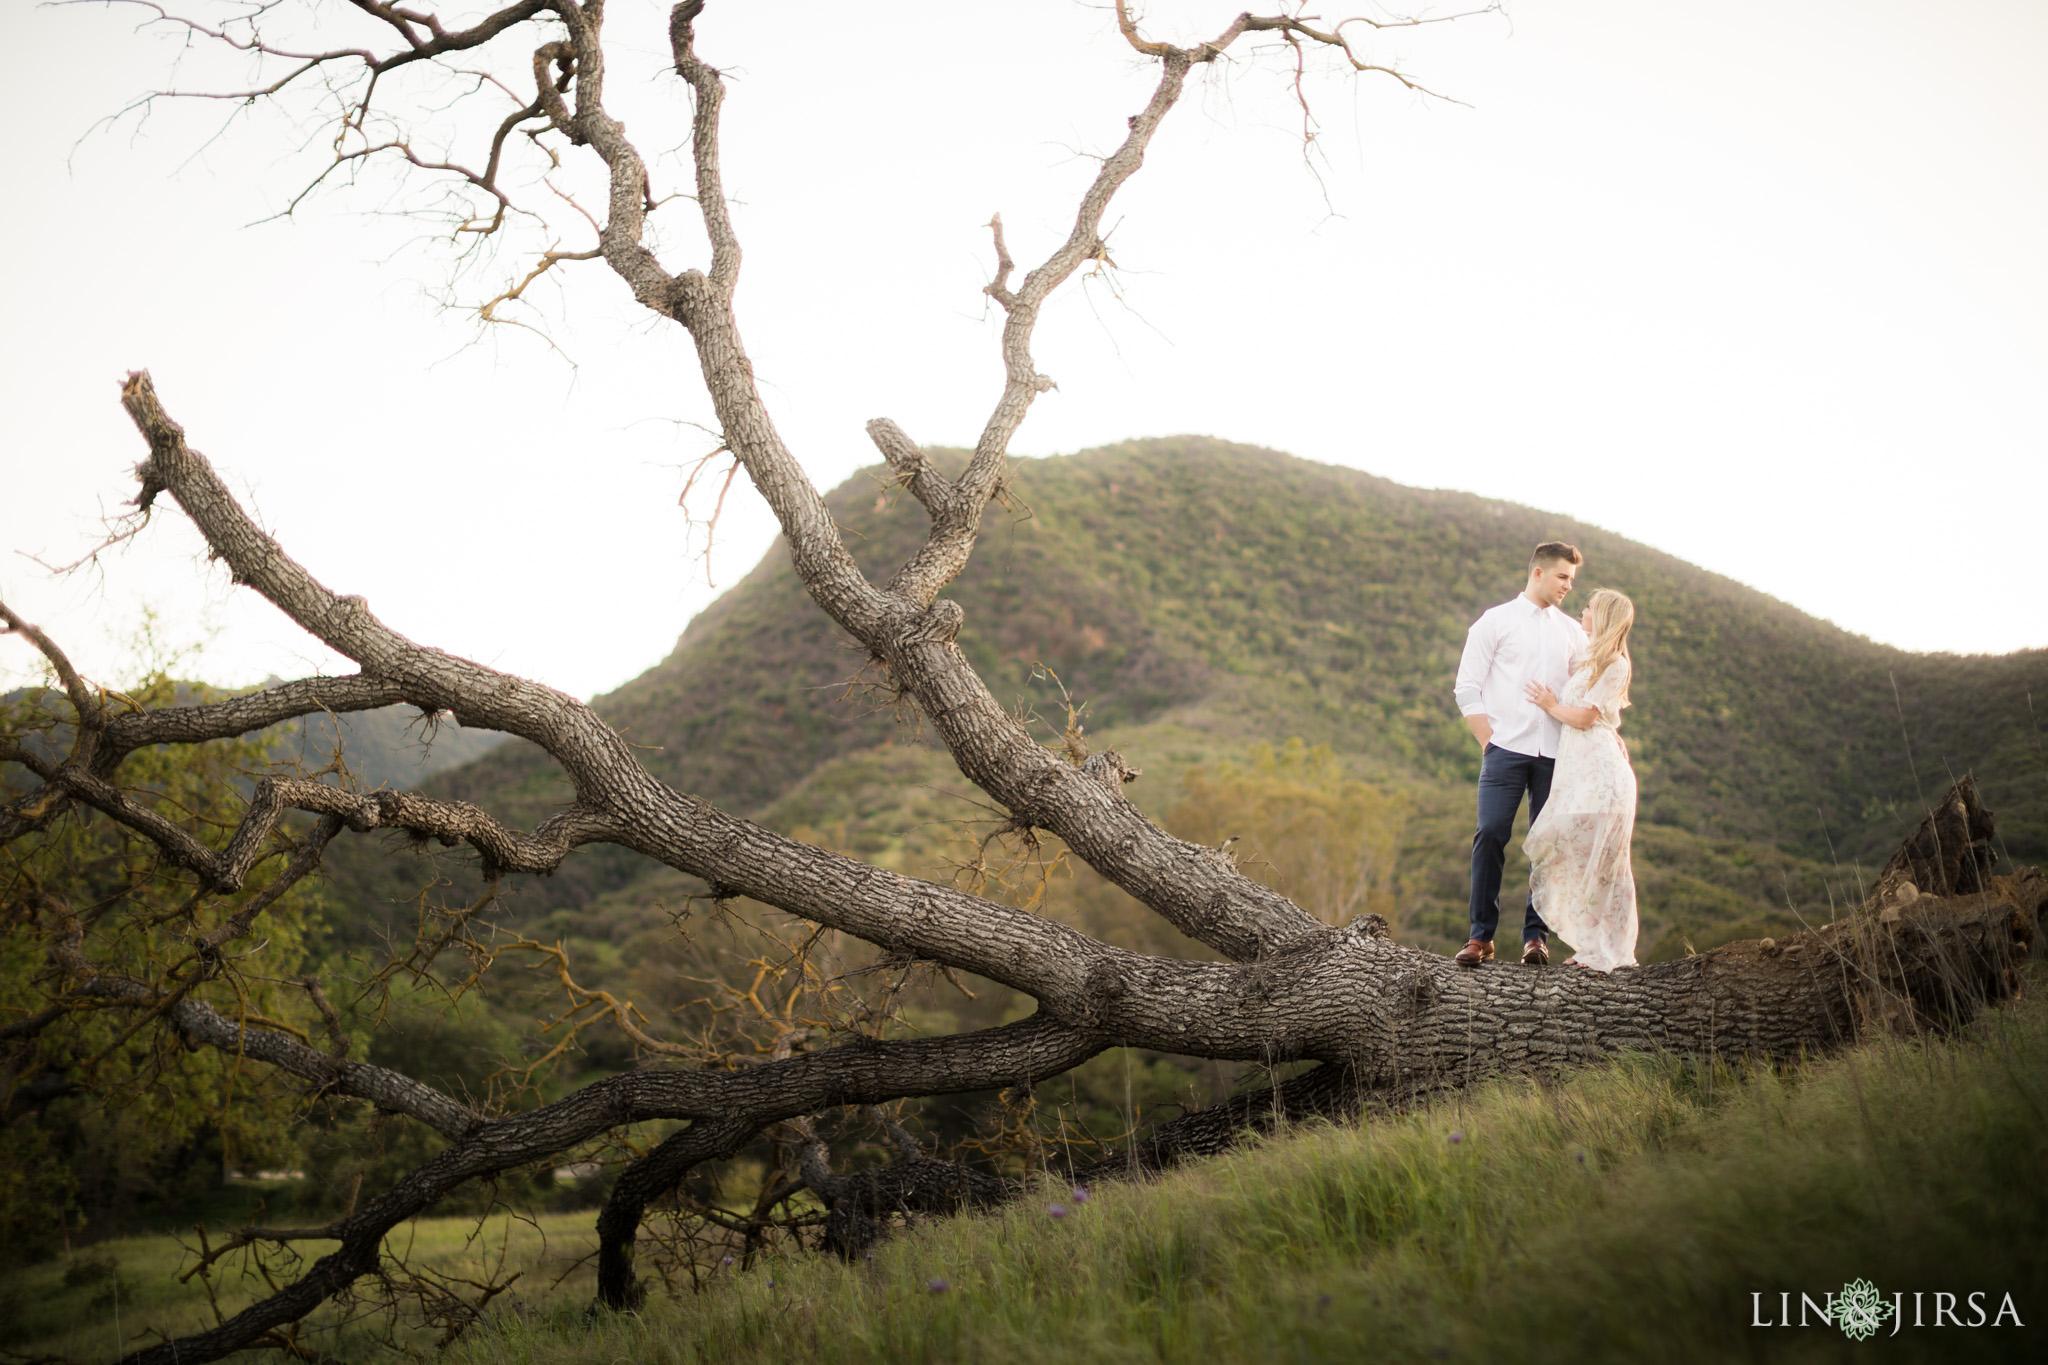 14-paramount-ranch-malibu-engagement-photography